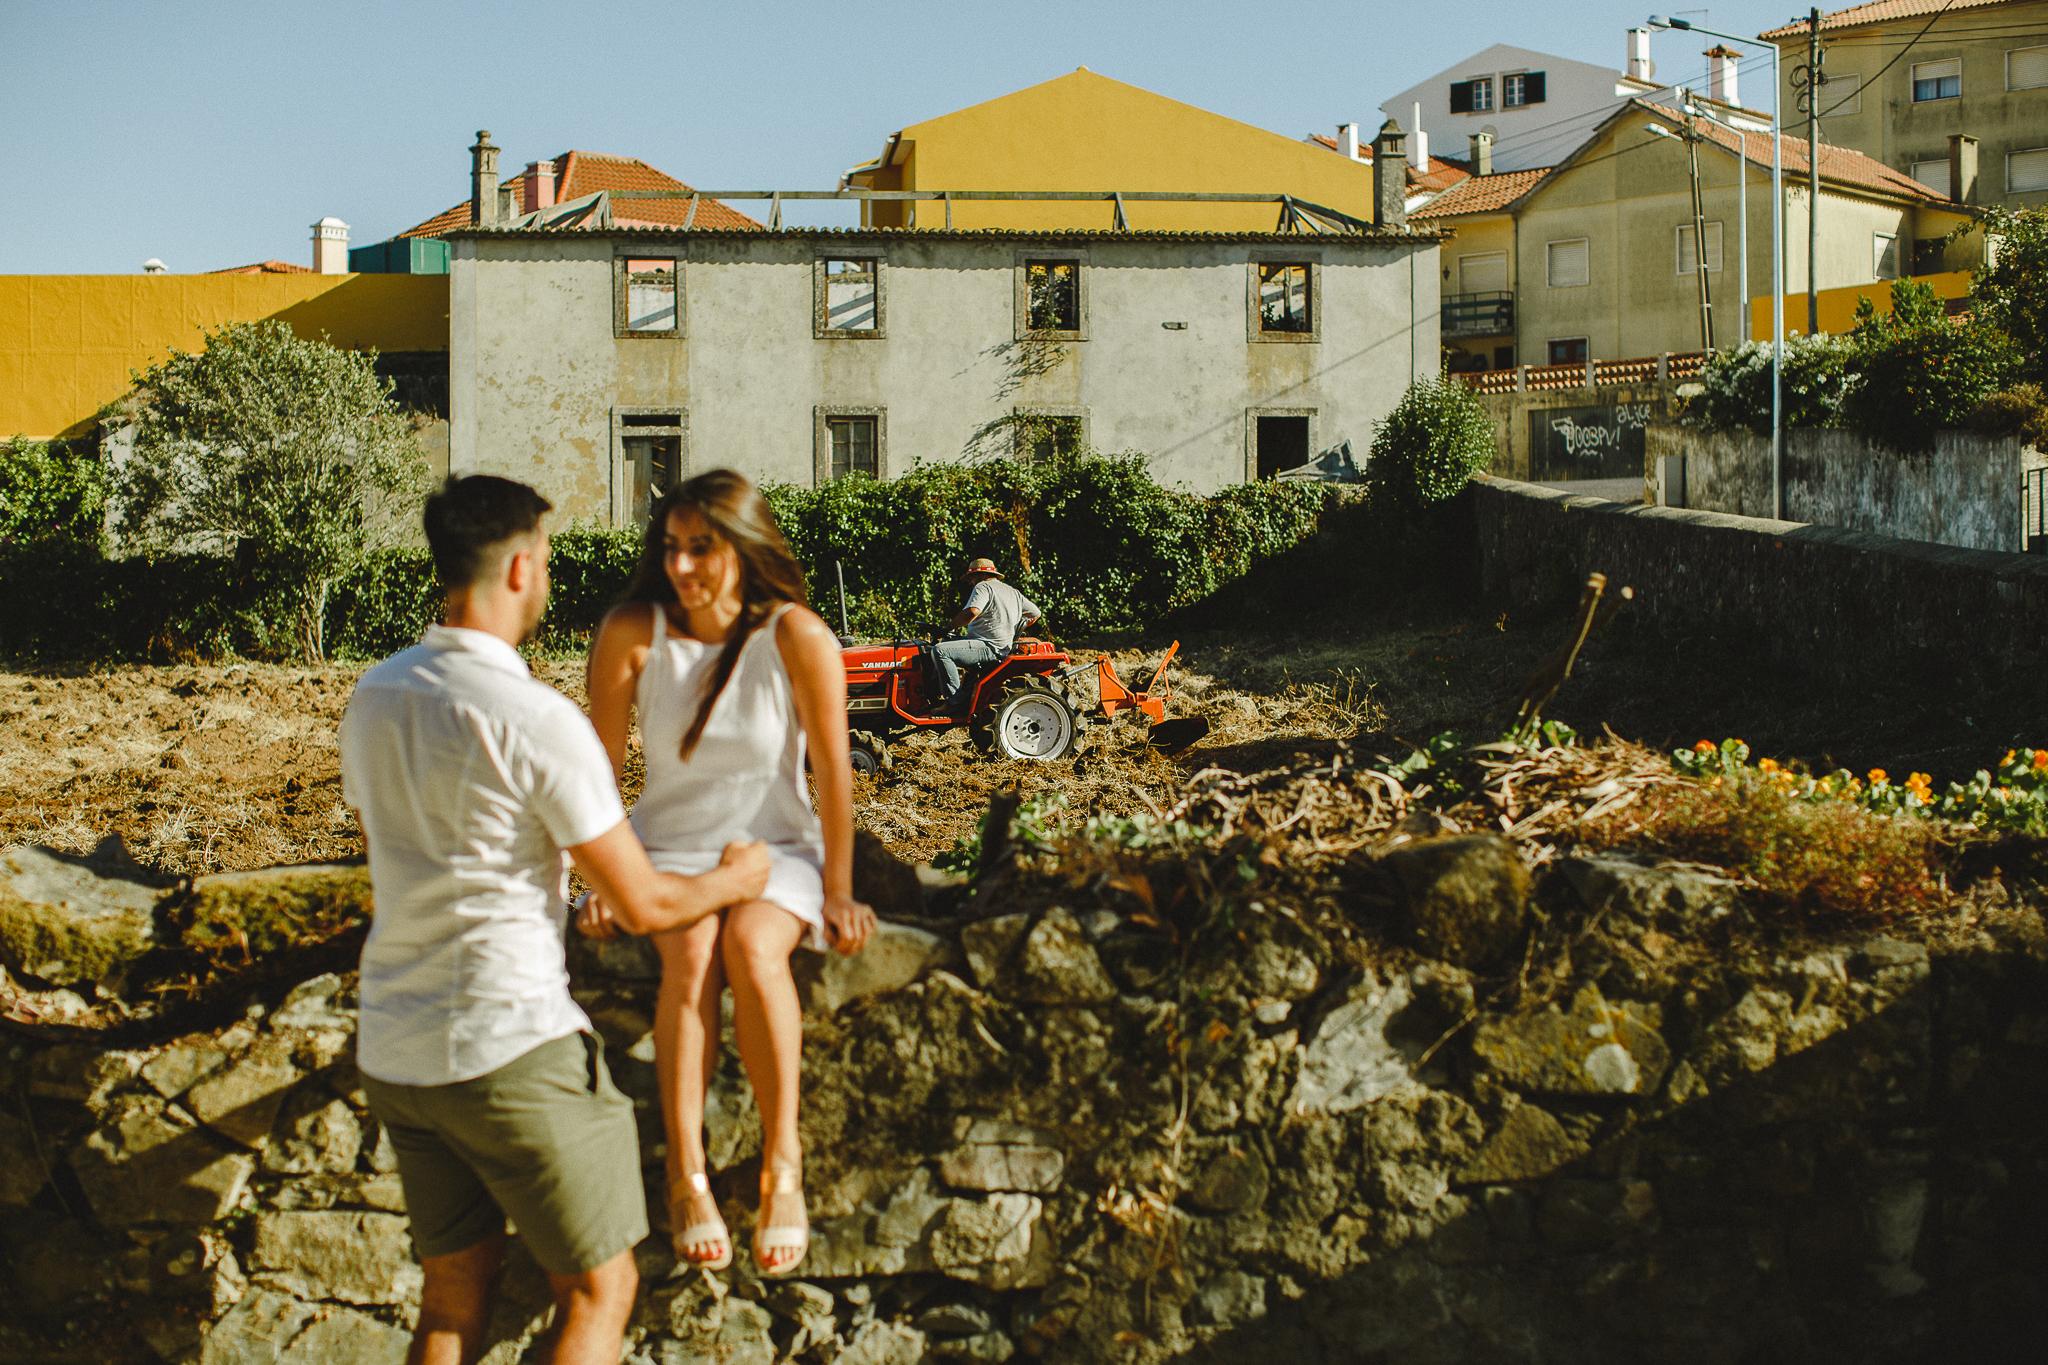 Engagement Shoot in Sintra, Destination Wedding in Portugal, Destination Wedding Photographer, Sessão de Namoro em Sintra por Hello Twiggs